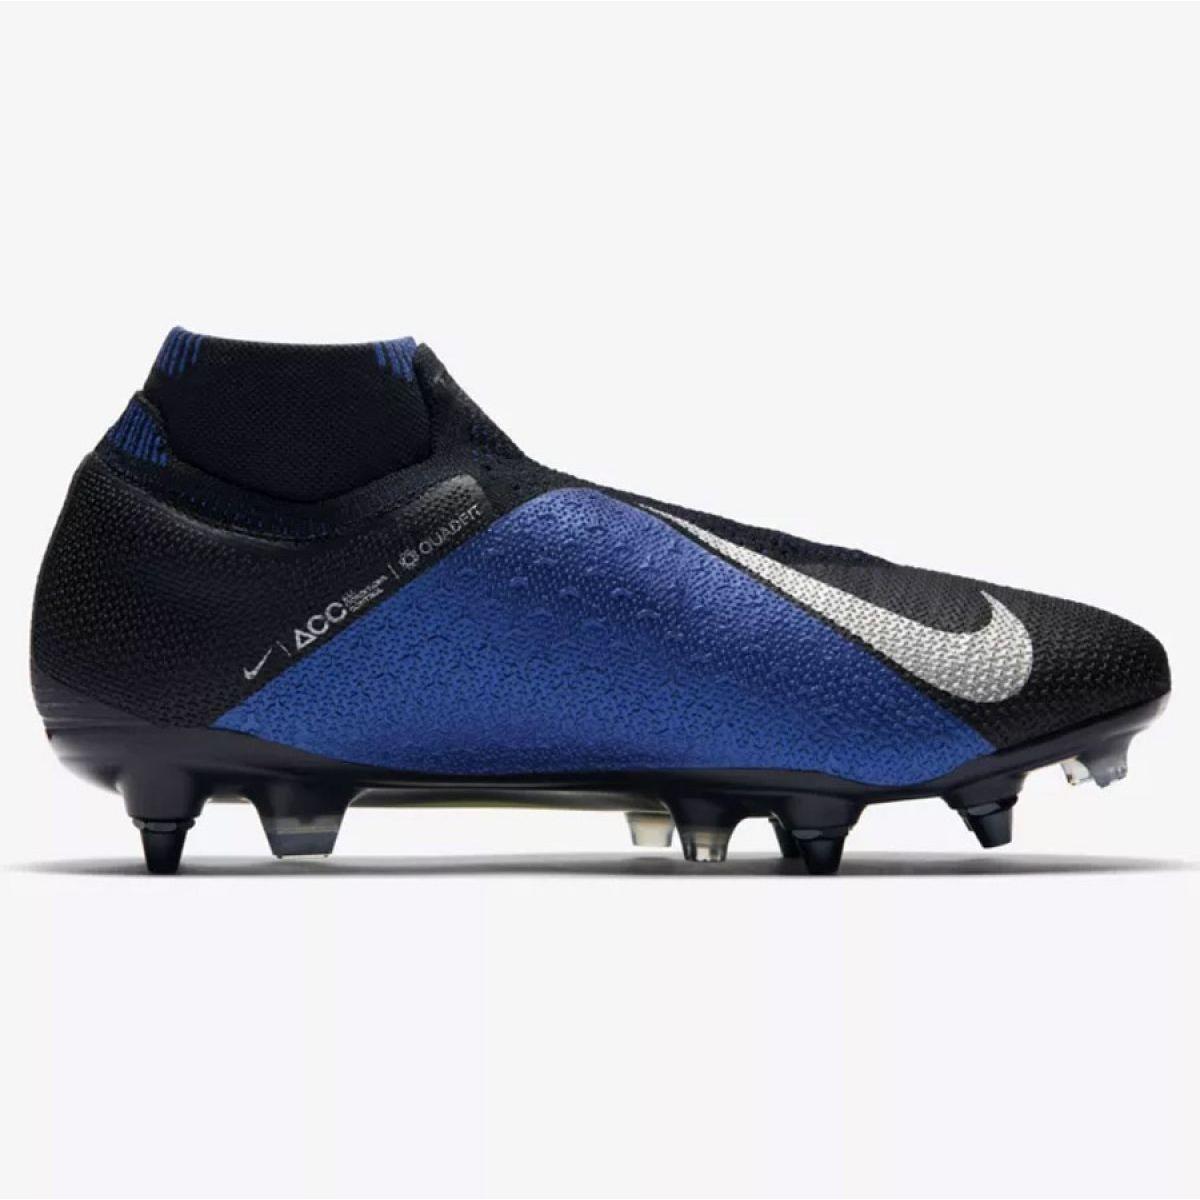 Chuteira Campo Nike Phantom VSN CL AJ6959 410 AzulBranco